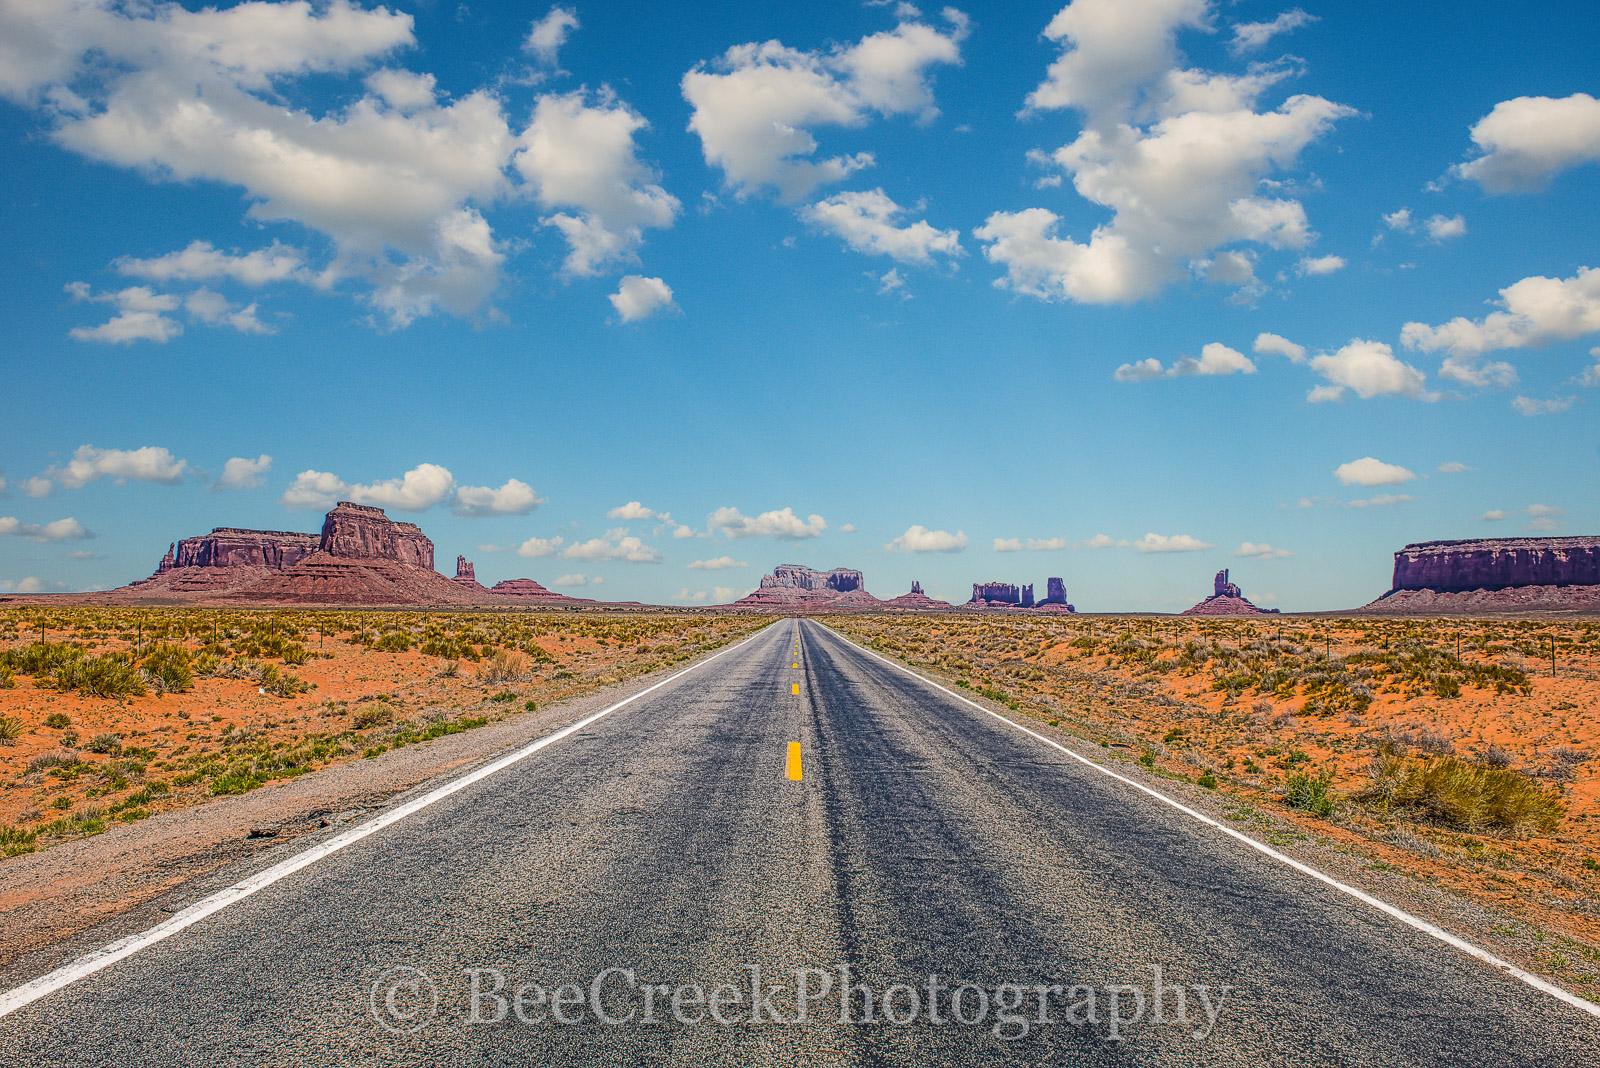 Arizona, Monument Valley AZ, desert, entering monument valley, erosion, geolgic, geology, landscape, landscapes, navajo indians, red rocks, sandstone, southwest, photo